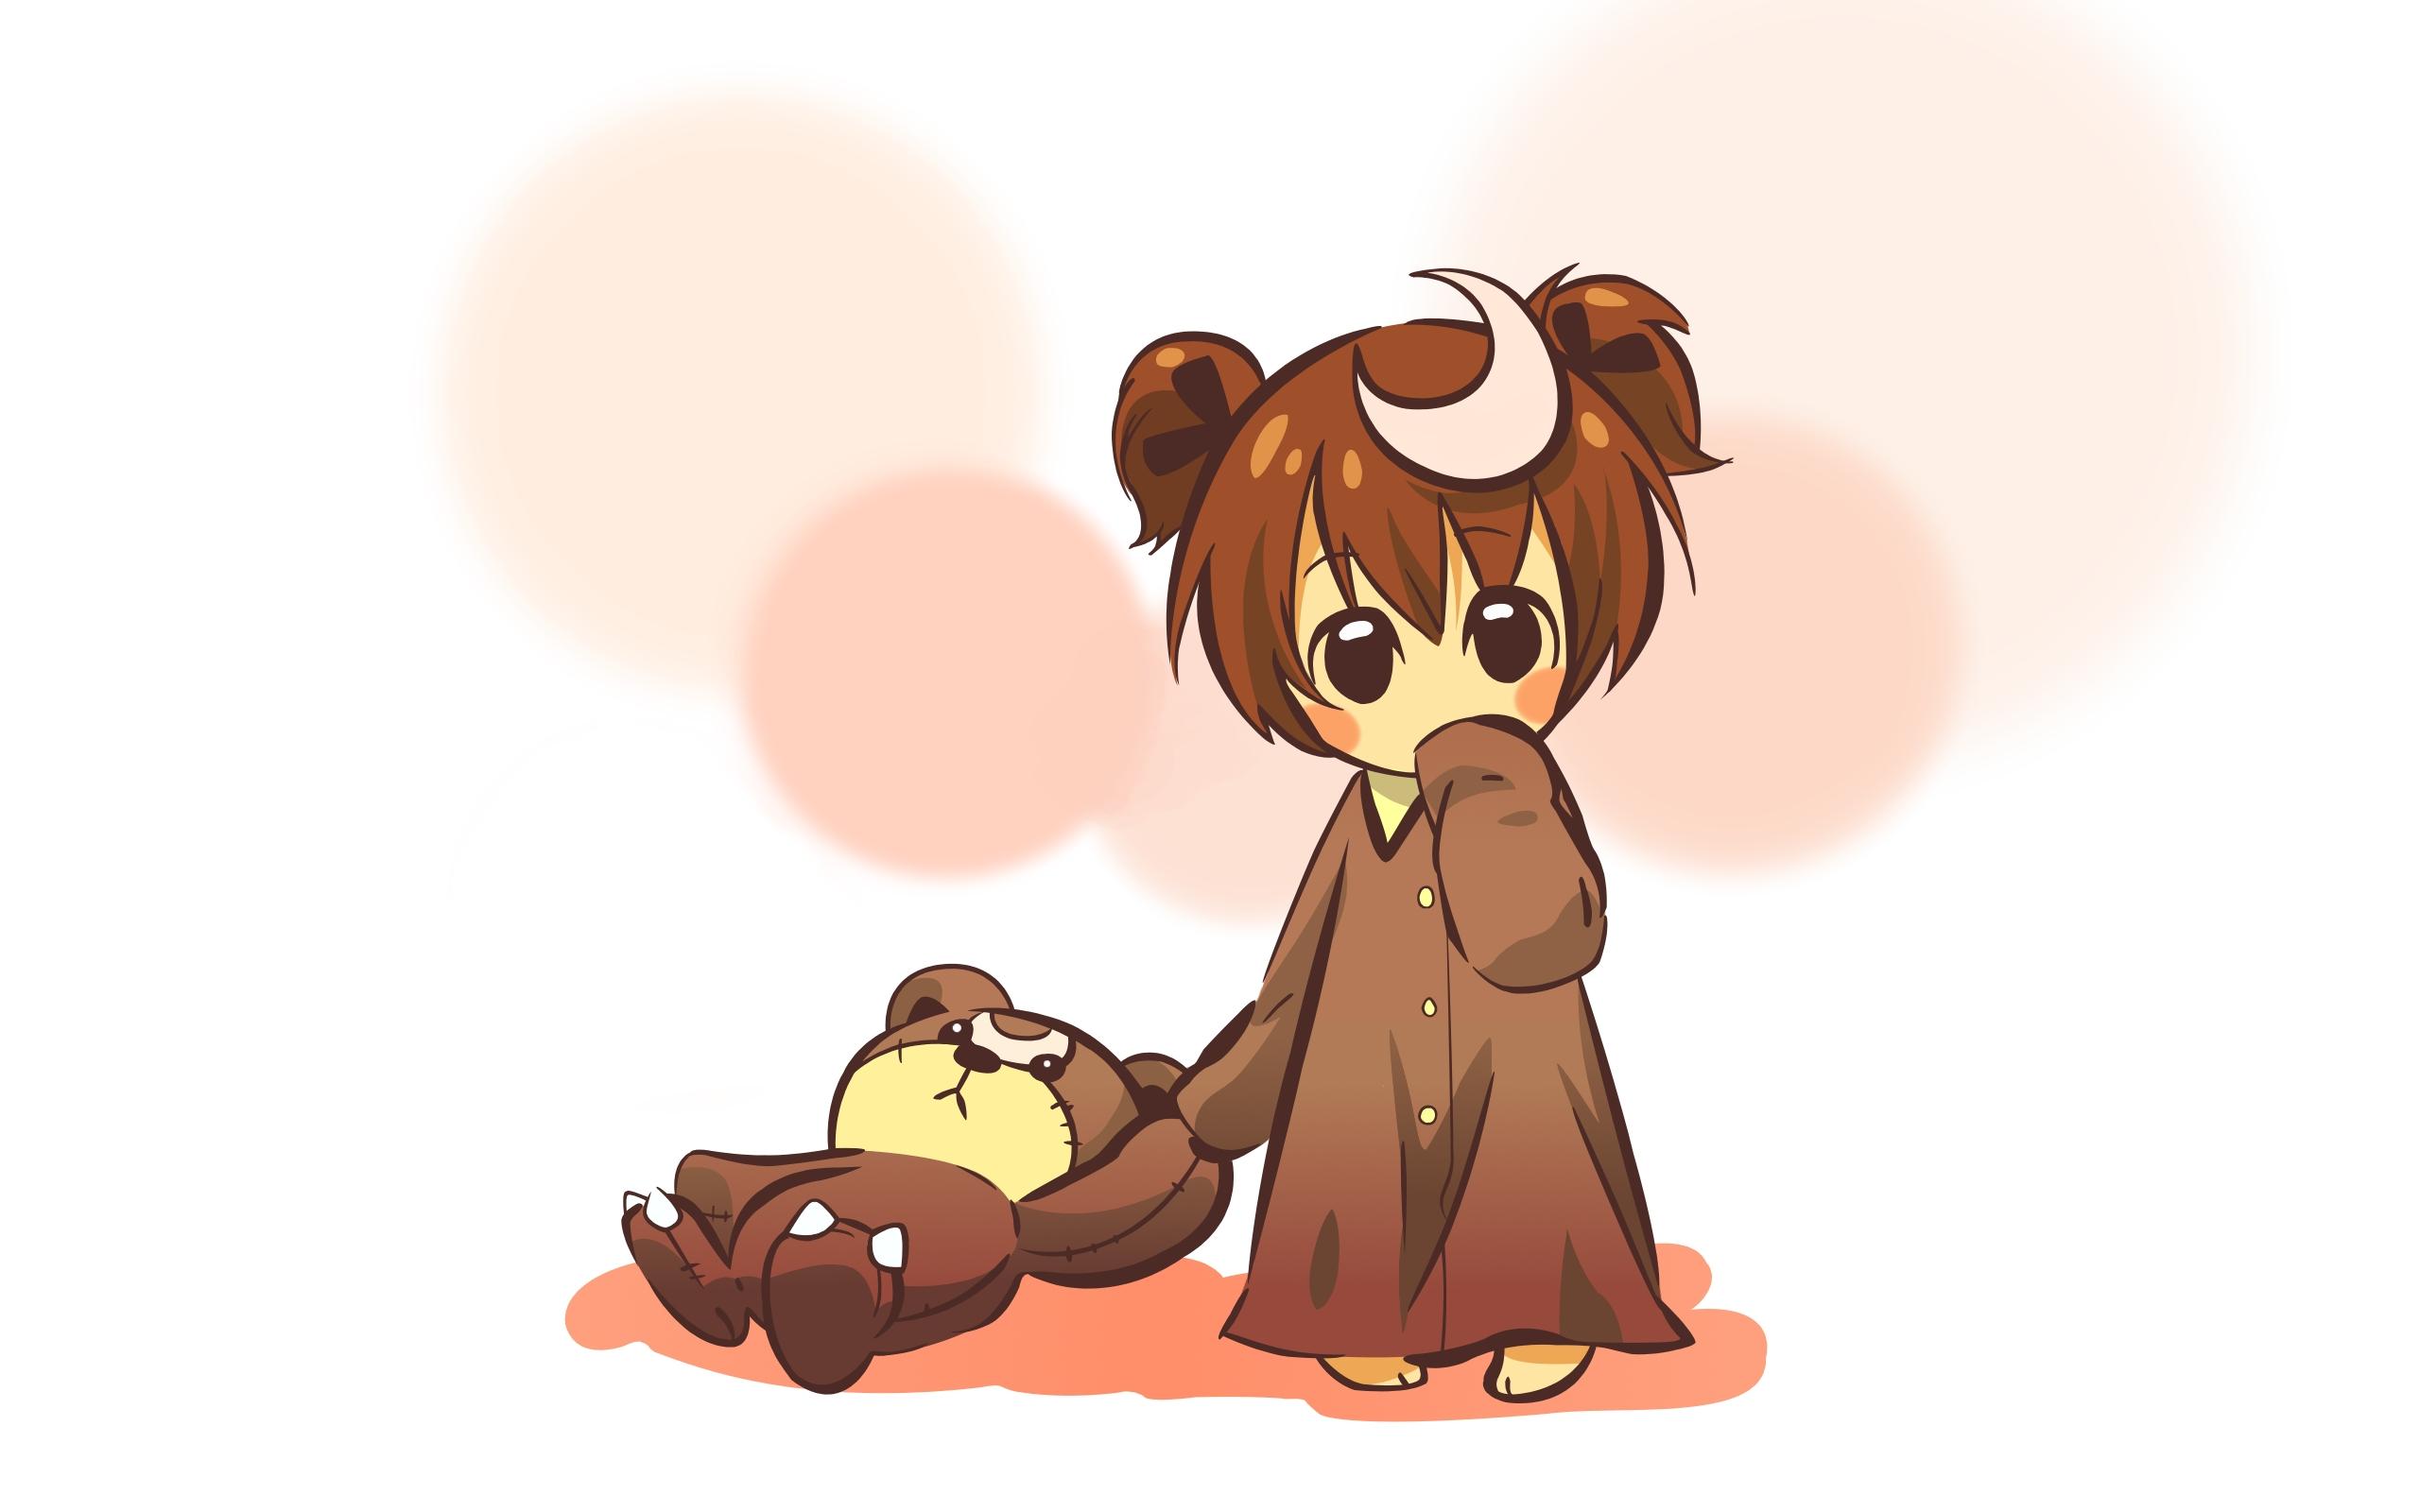 wallpaper : anime, girl, cute, toy, bear, background 2560x1600